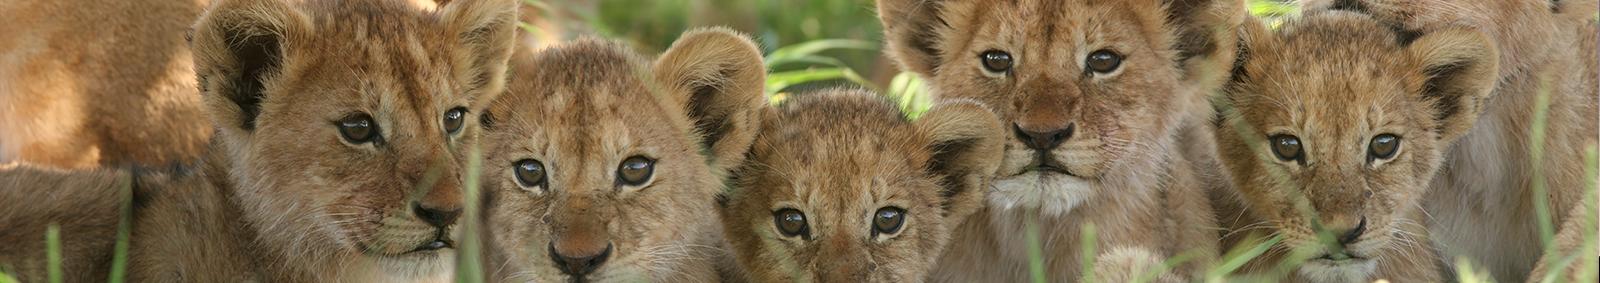 Lion Cubs Africa